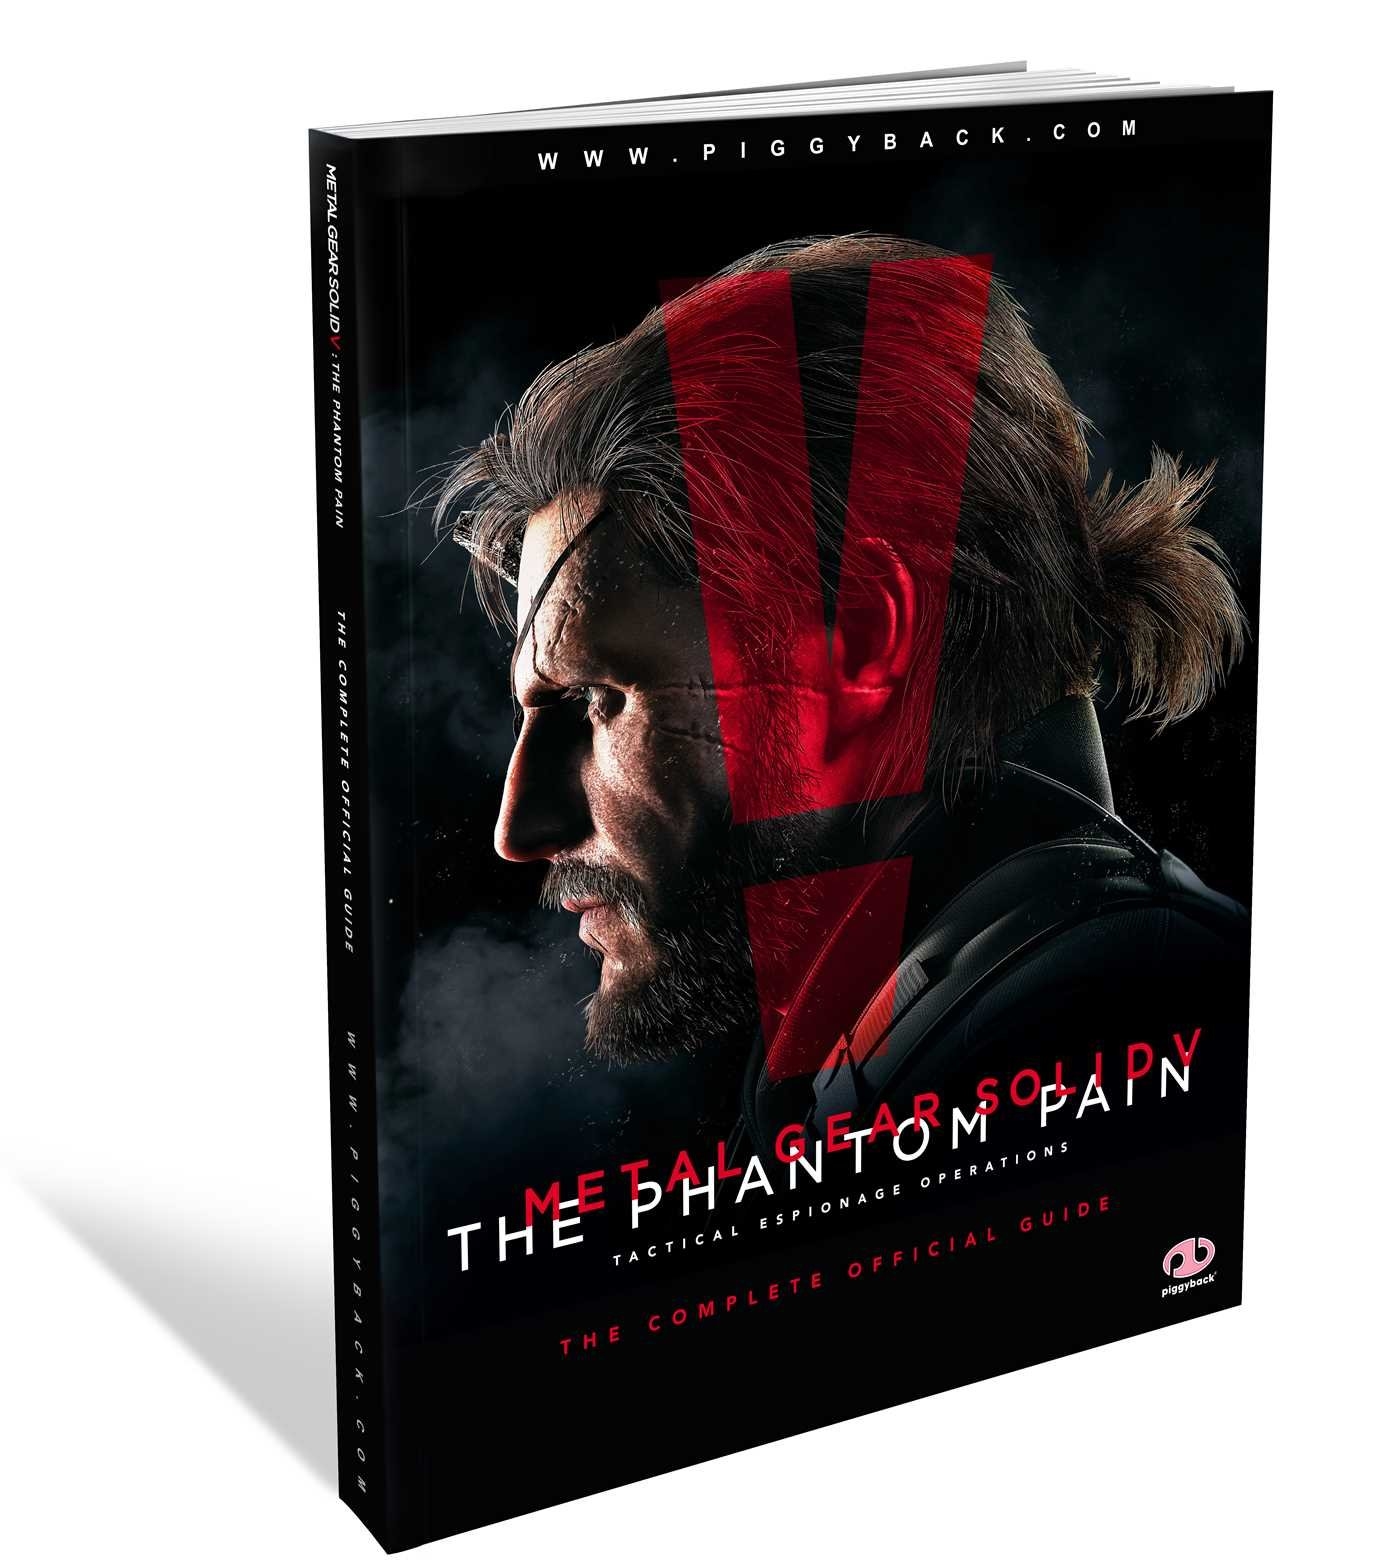 20 minut z Metal Gear Solid V: The Phantom Pain 109823